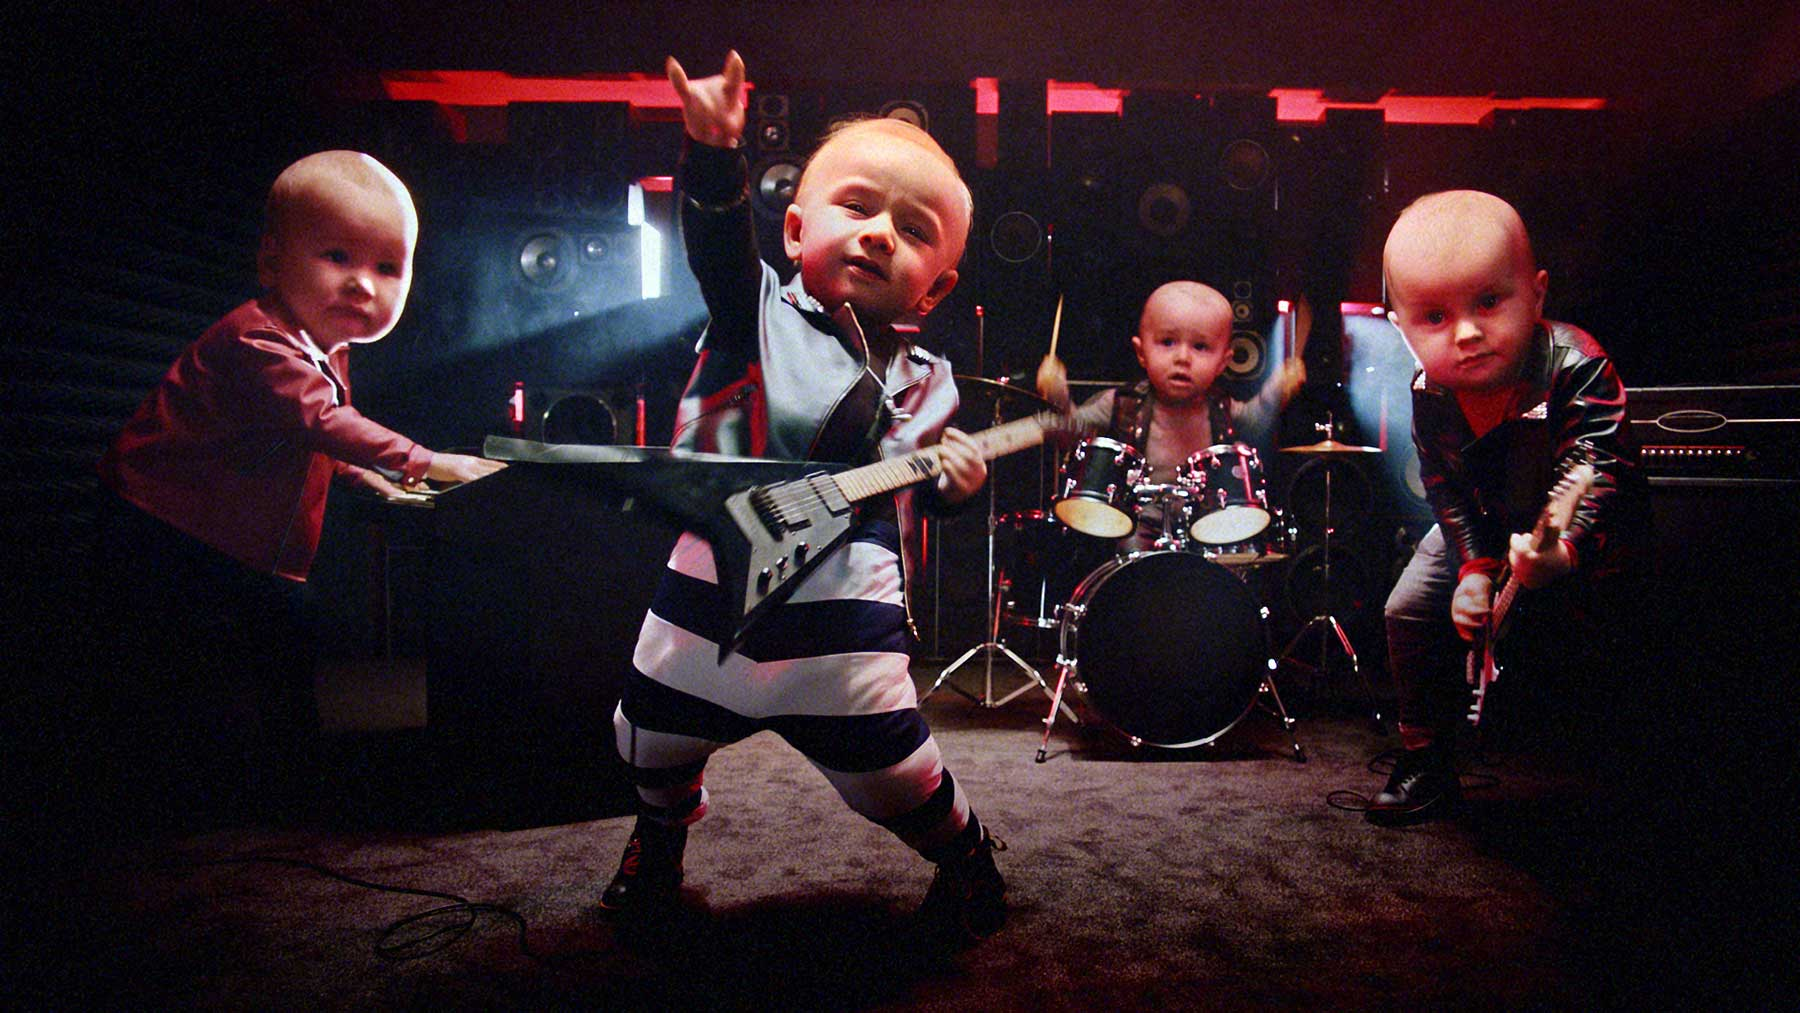 Diese Babies rocken gegen Gemüse netto-babies-rocken-gemuese_01